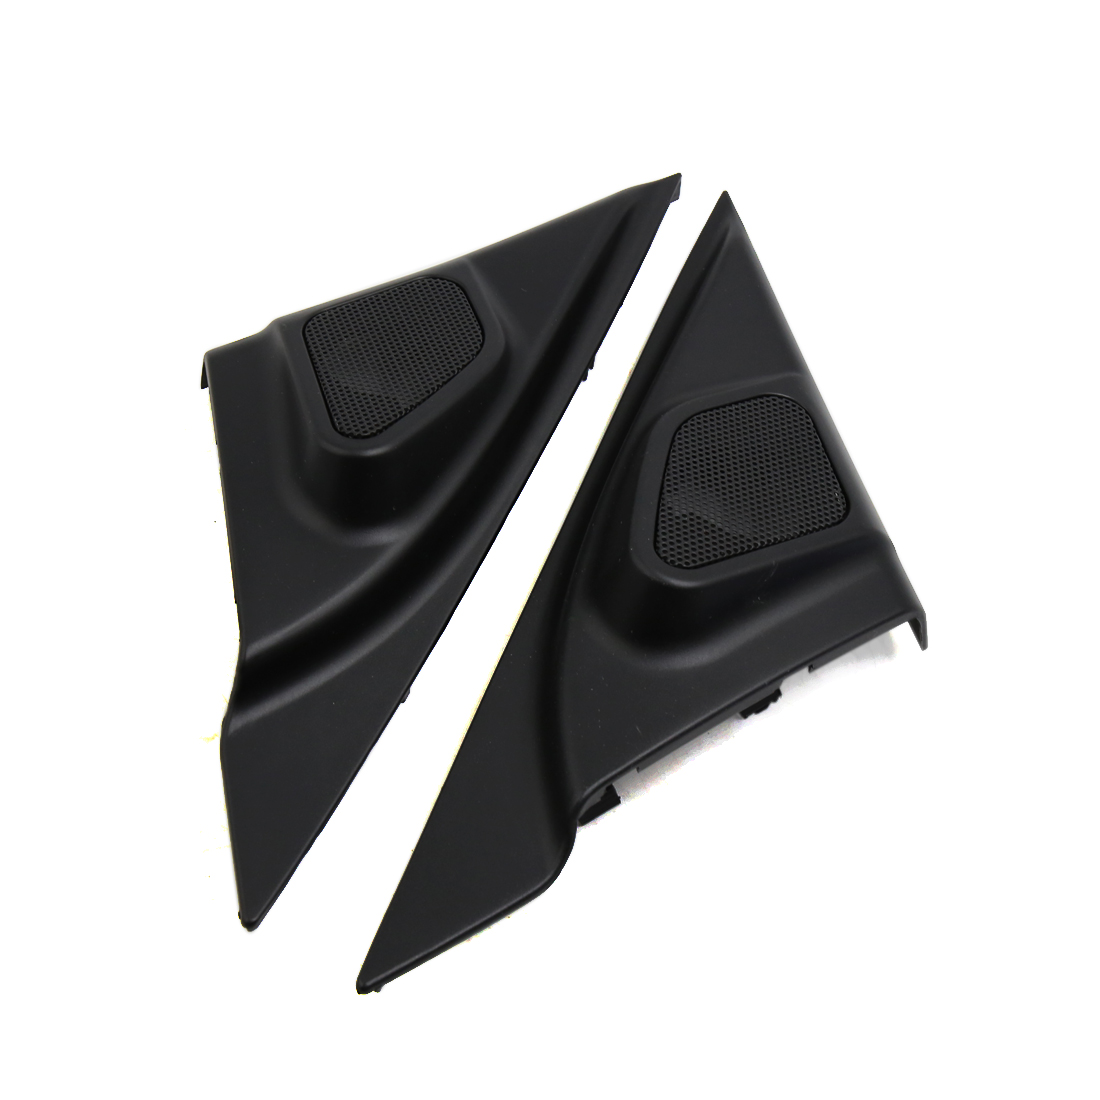 2 Pcs 6 x 5cm Mesh Black Car Tweeter Trumpet Dustproof Cover for Mazda 3